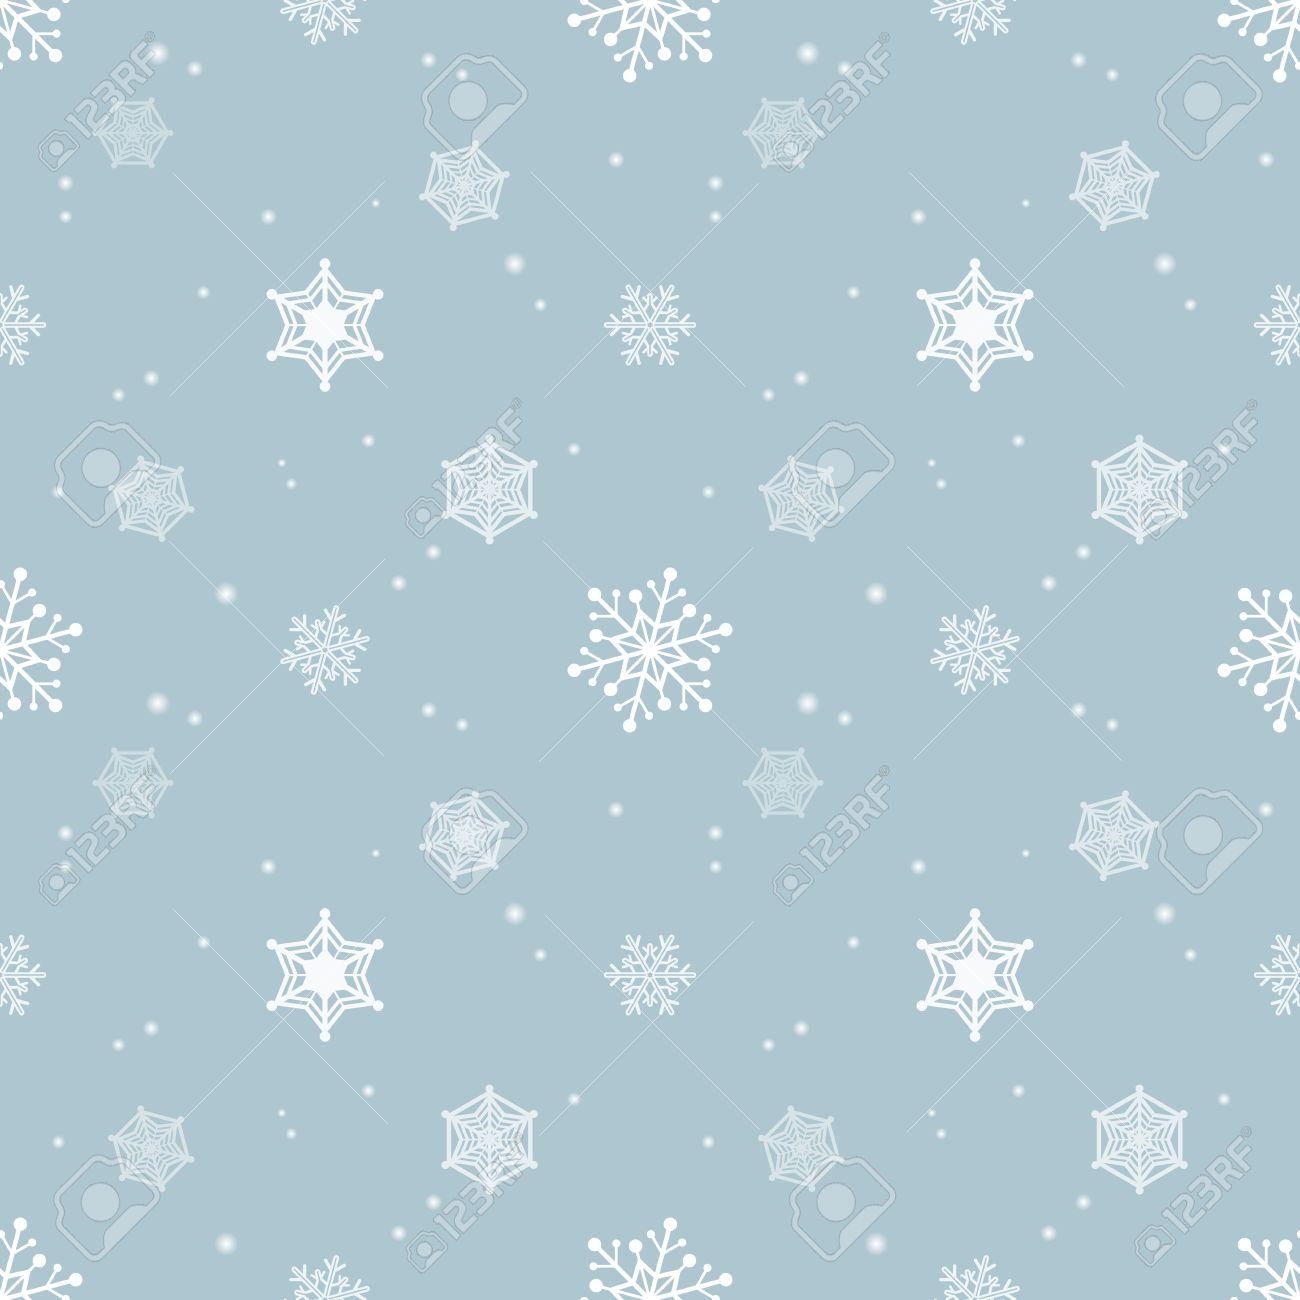 67587847 snowflake blue pastel colour background christmas pattern tint layer wallpaper